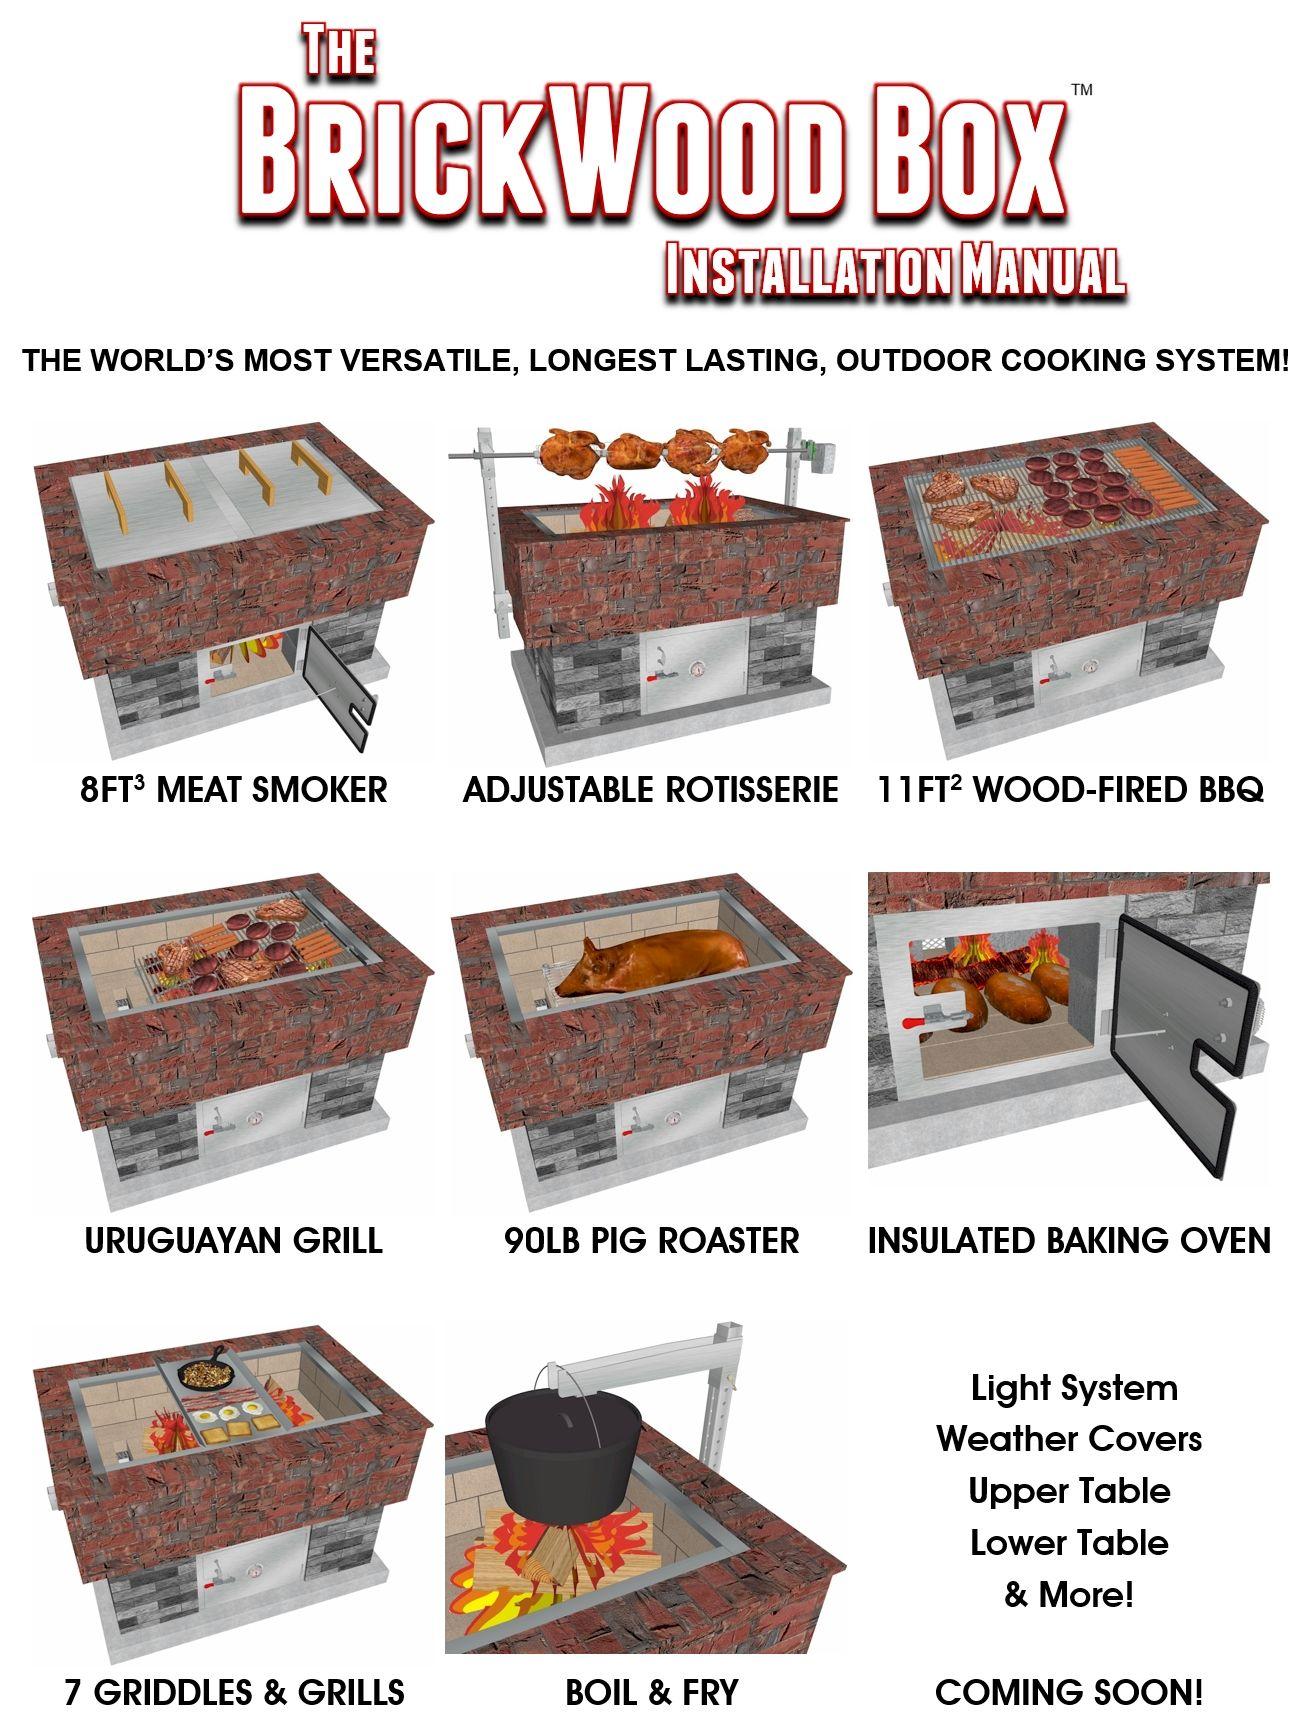 The Brickwood Box The World S Most Versatile Longest Lasting